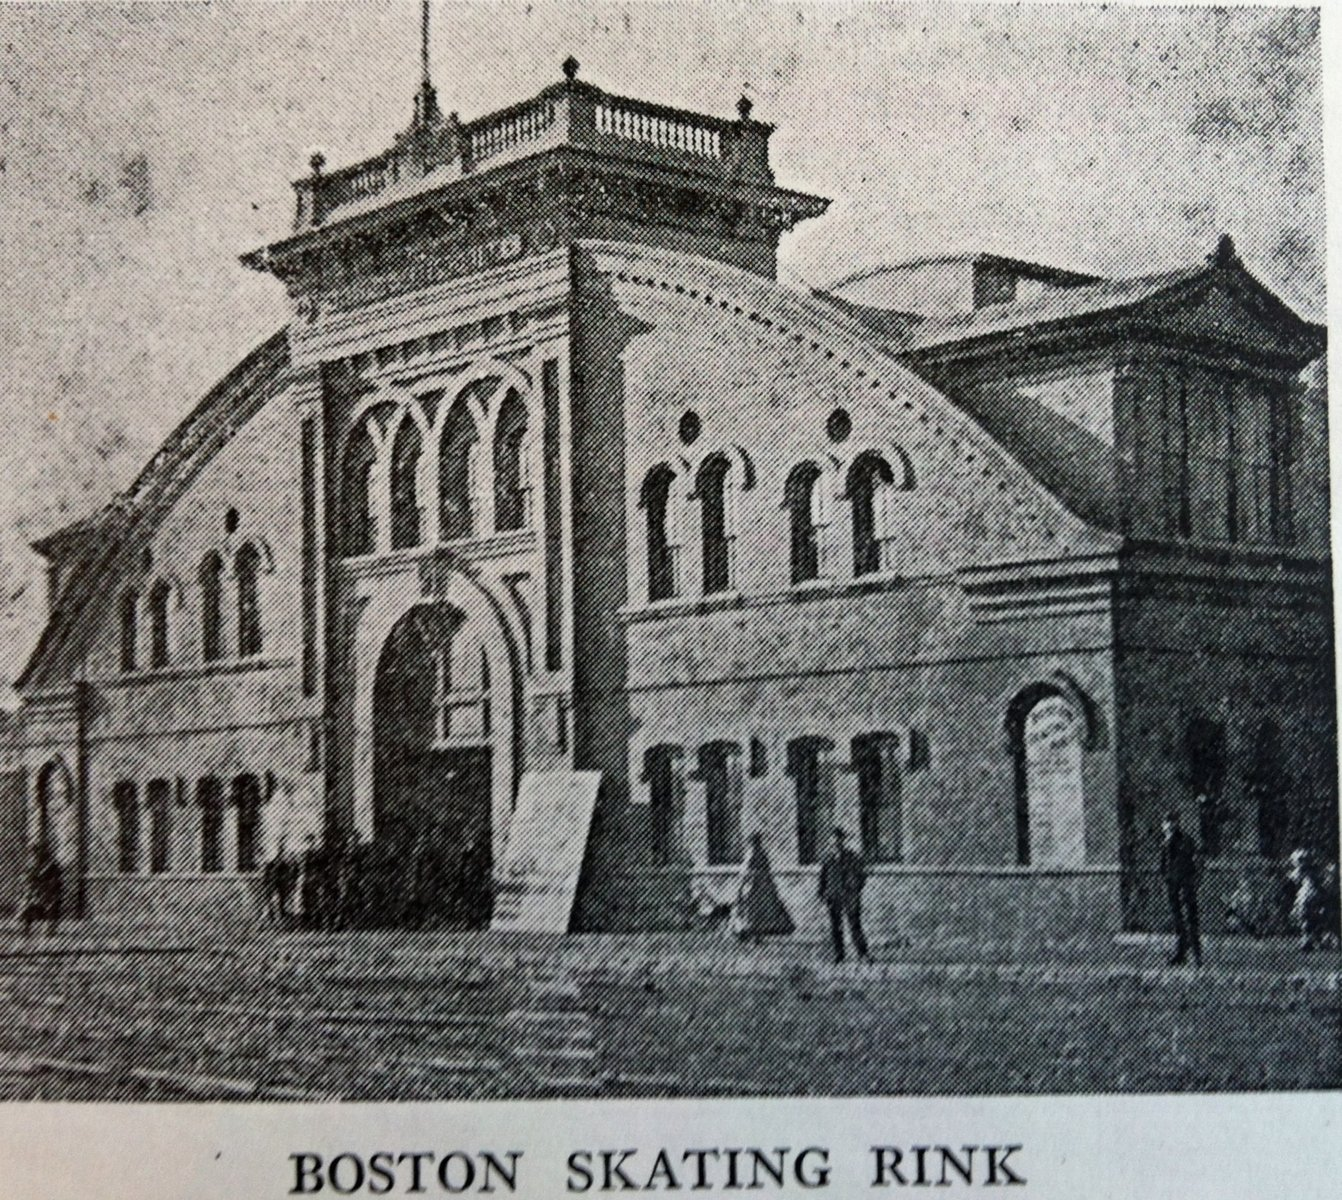 Boston Skating Rink